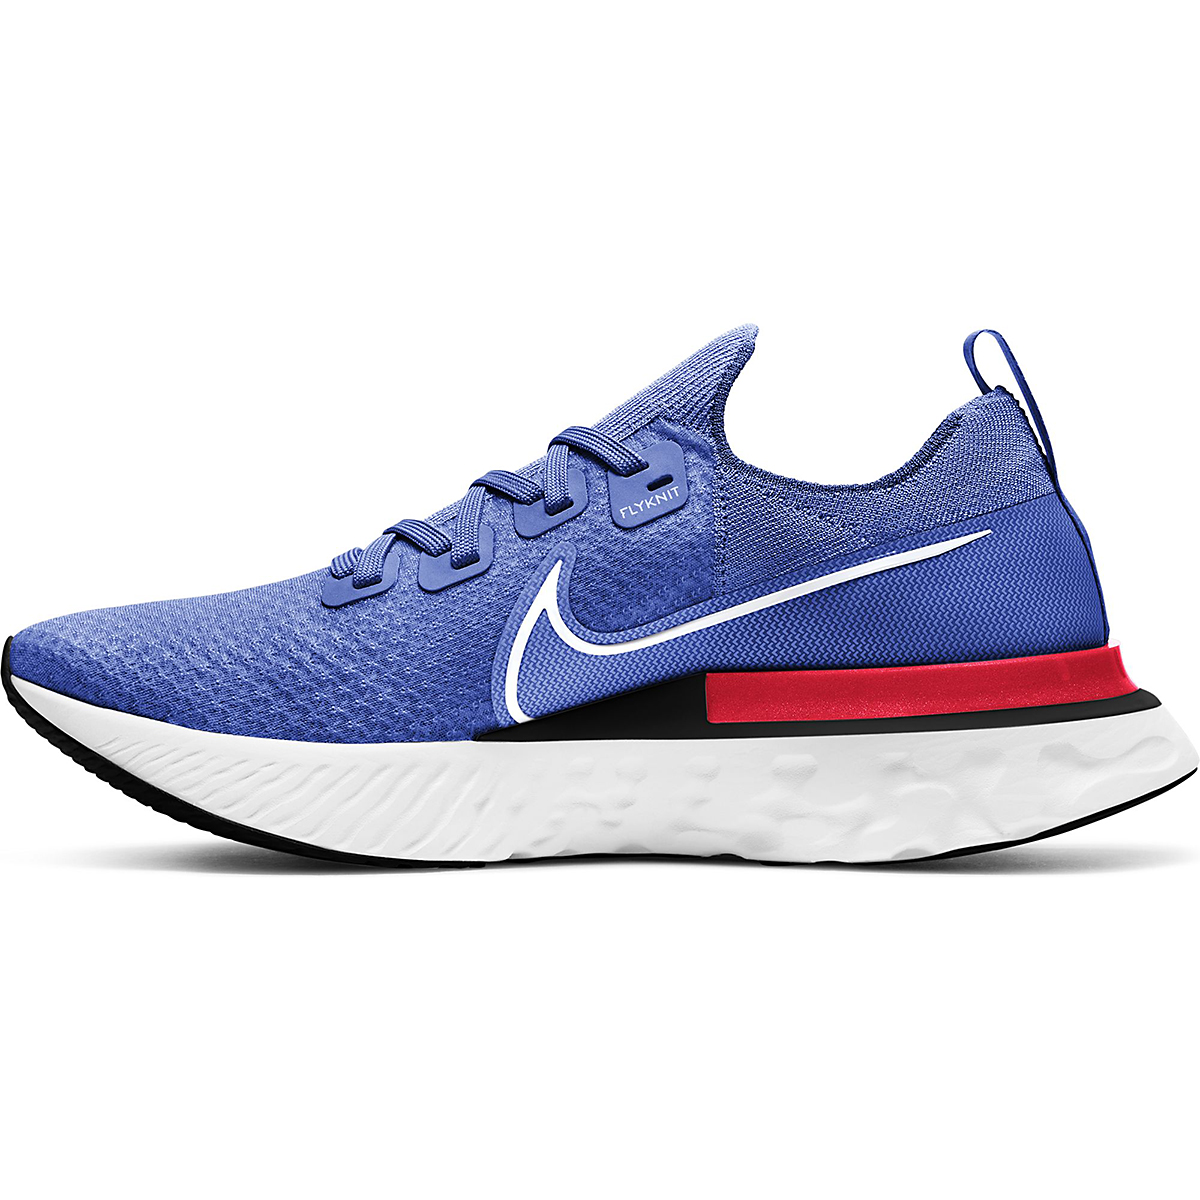 Men's Nike Nike React Infinity Run Flyknit Running Shoe - Color: Racer Blue/White-Bright Crimson-Black - Size: 6.5 - Width: Regular, Racer Blue/White-Bright Crimson-Black, large, image 2